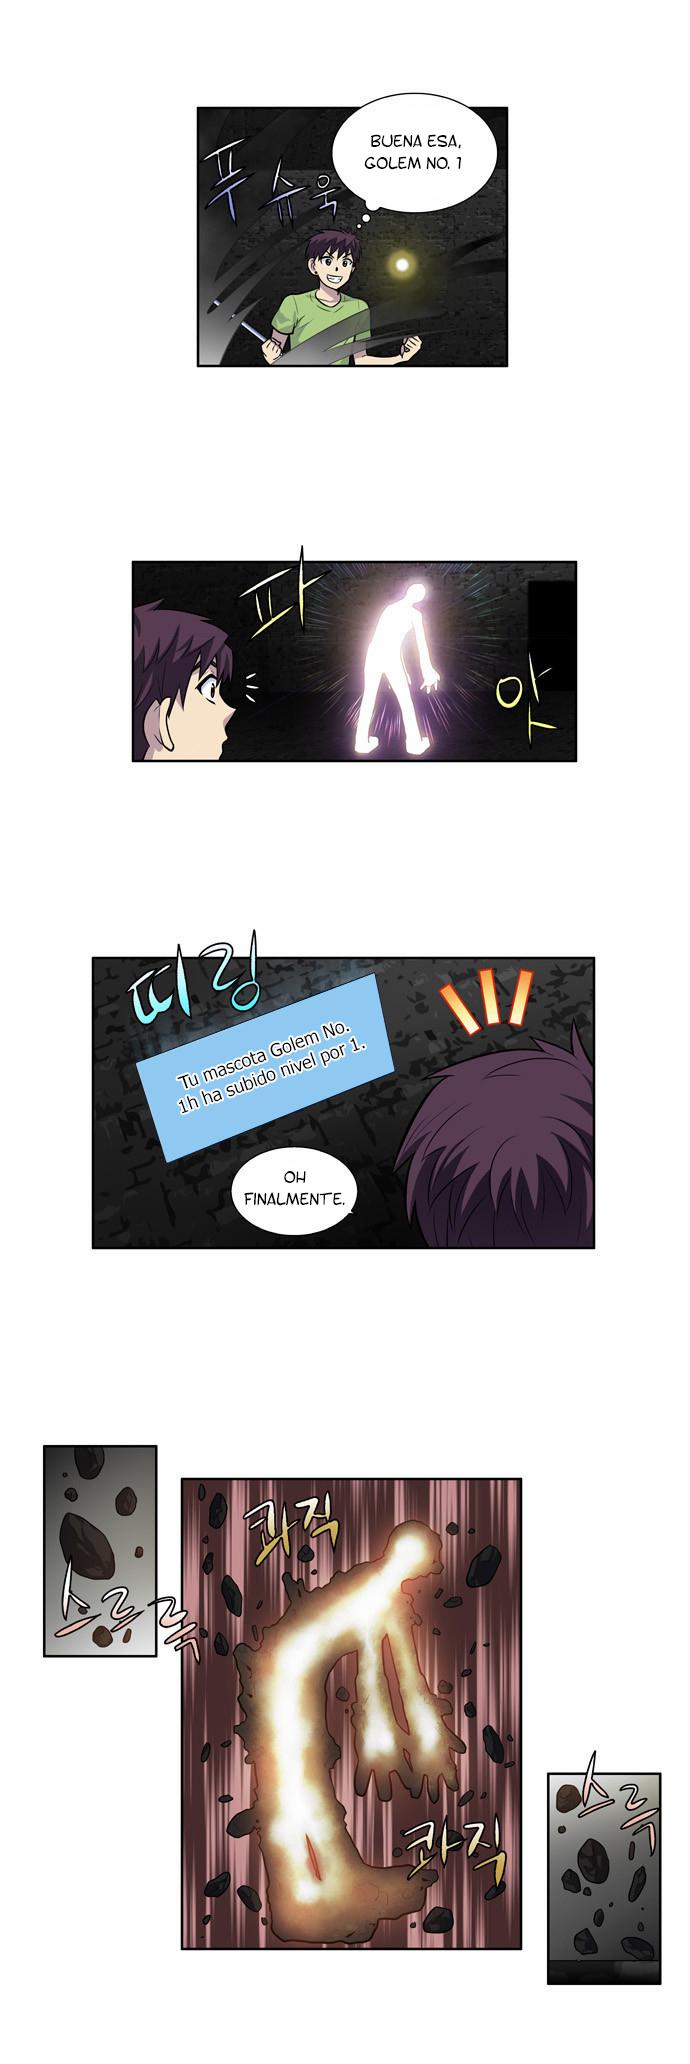 http://c5.ninemanga.com/es_manga/61/1725/420034/dacb8cf07e5031179a2da26abd616327.jpg Page 4